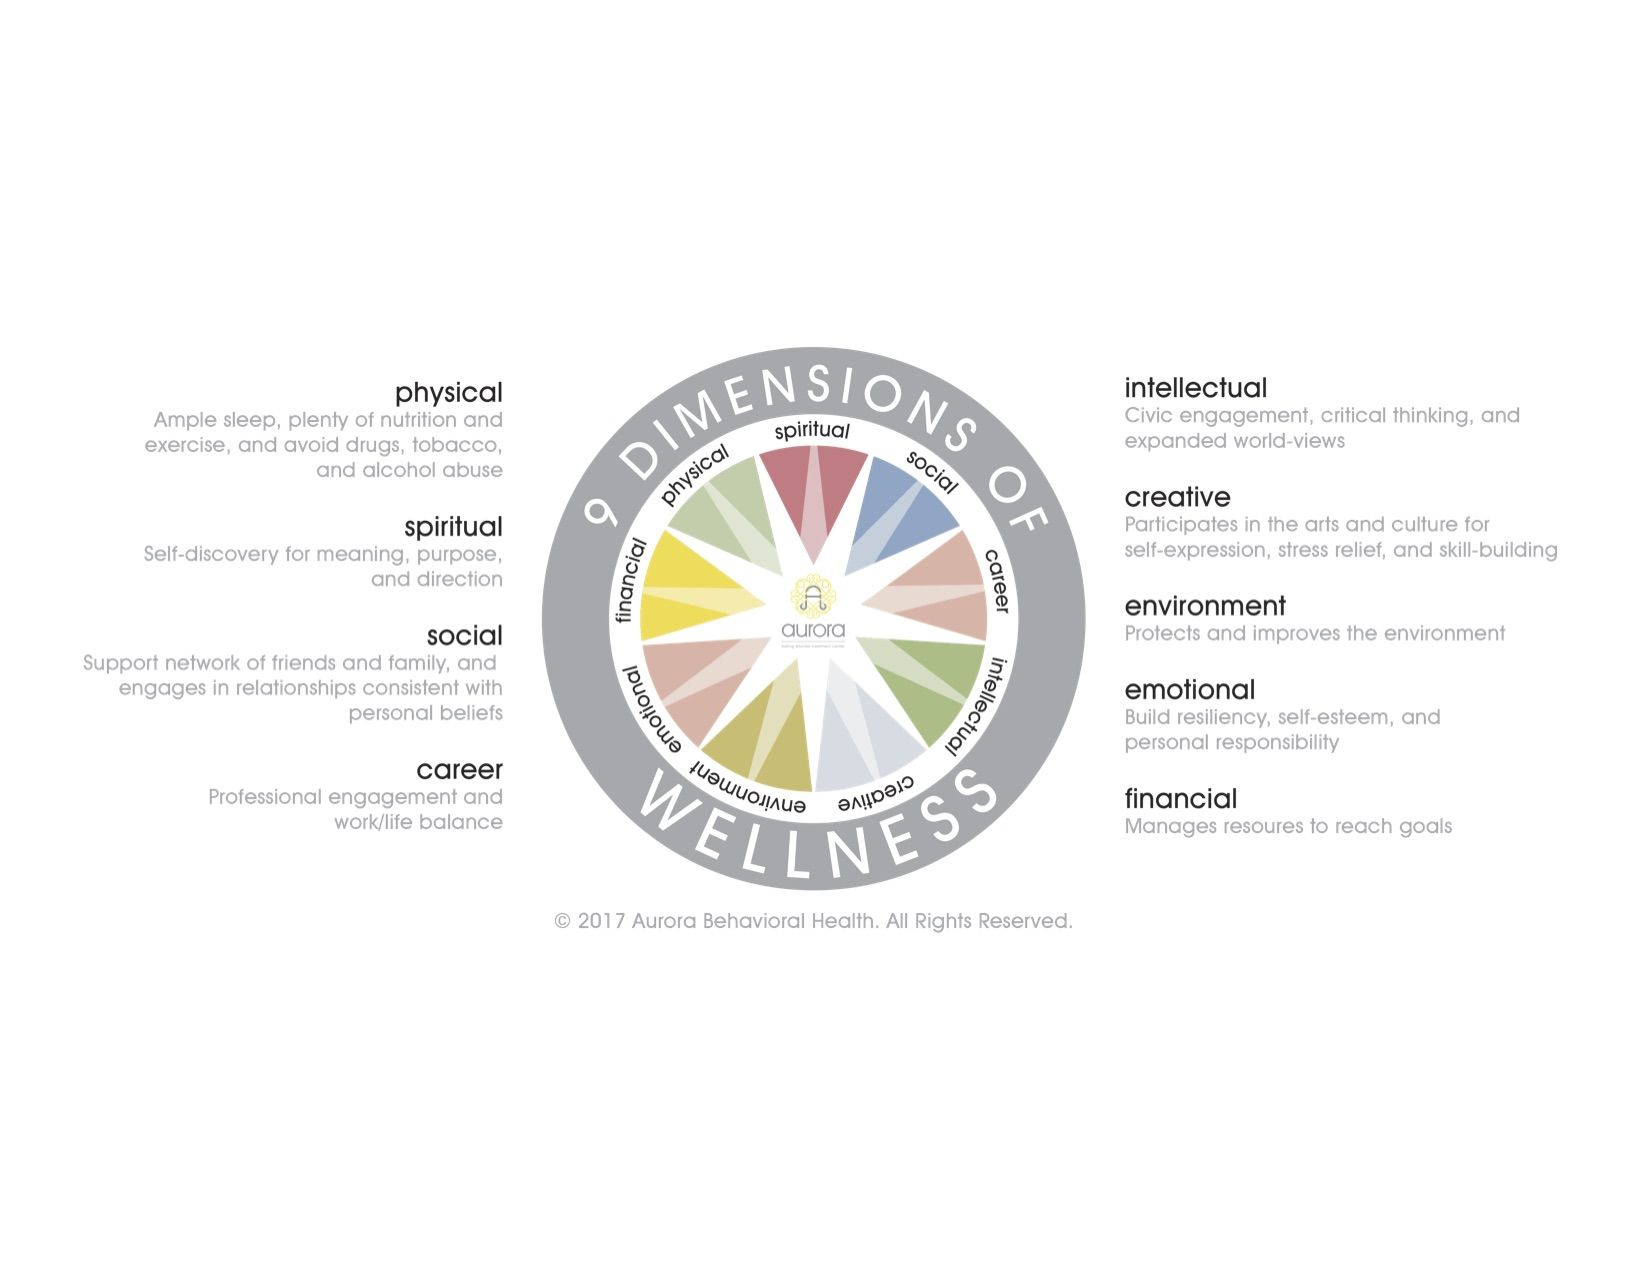 9 Dimensions of Wellness | Mental health | Mental health